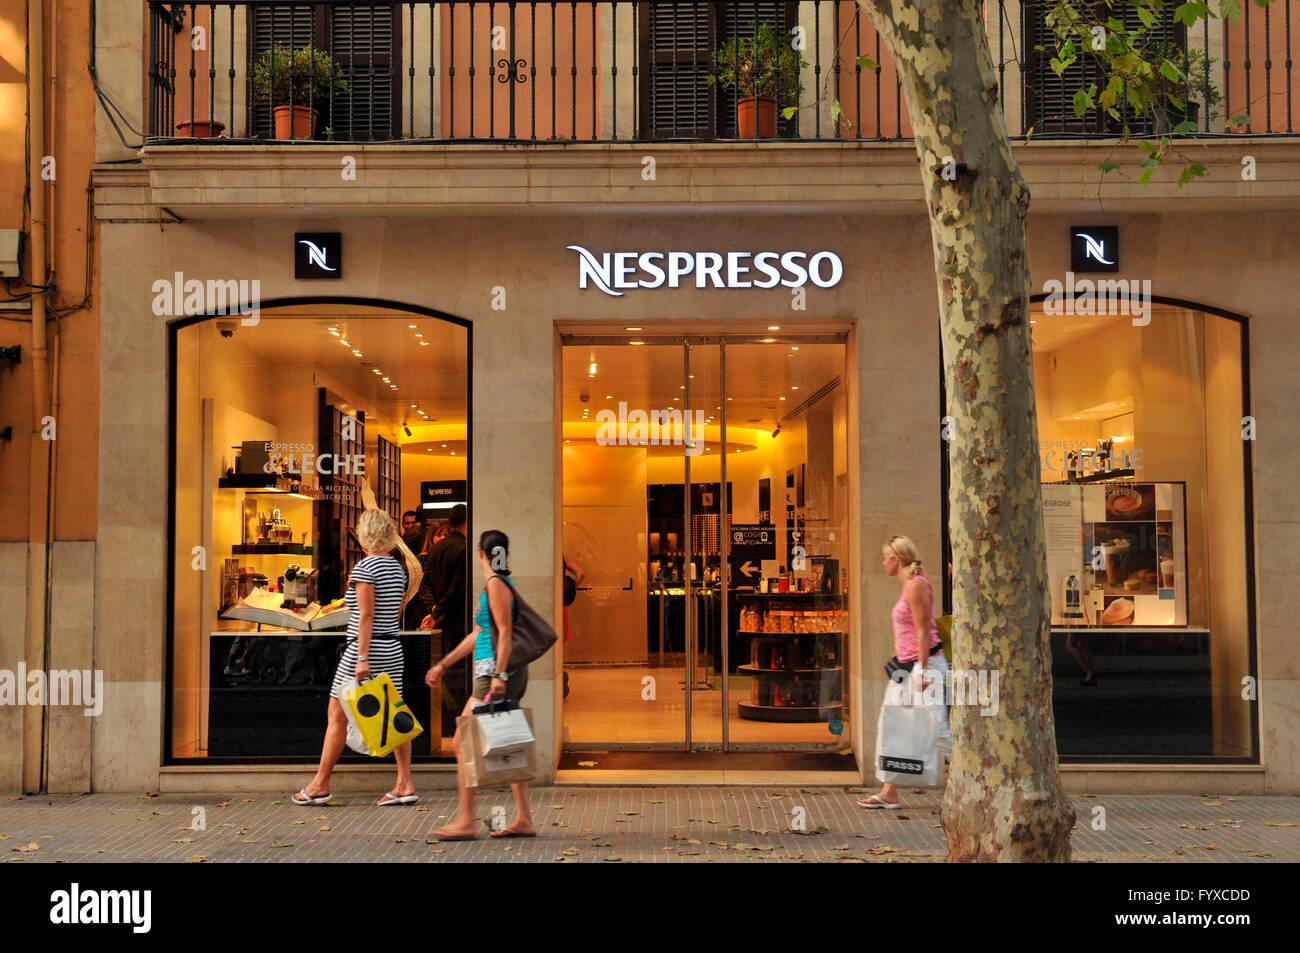 Nespresso shop, old part of town, Palma de Mallorca ...